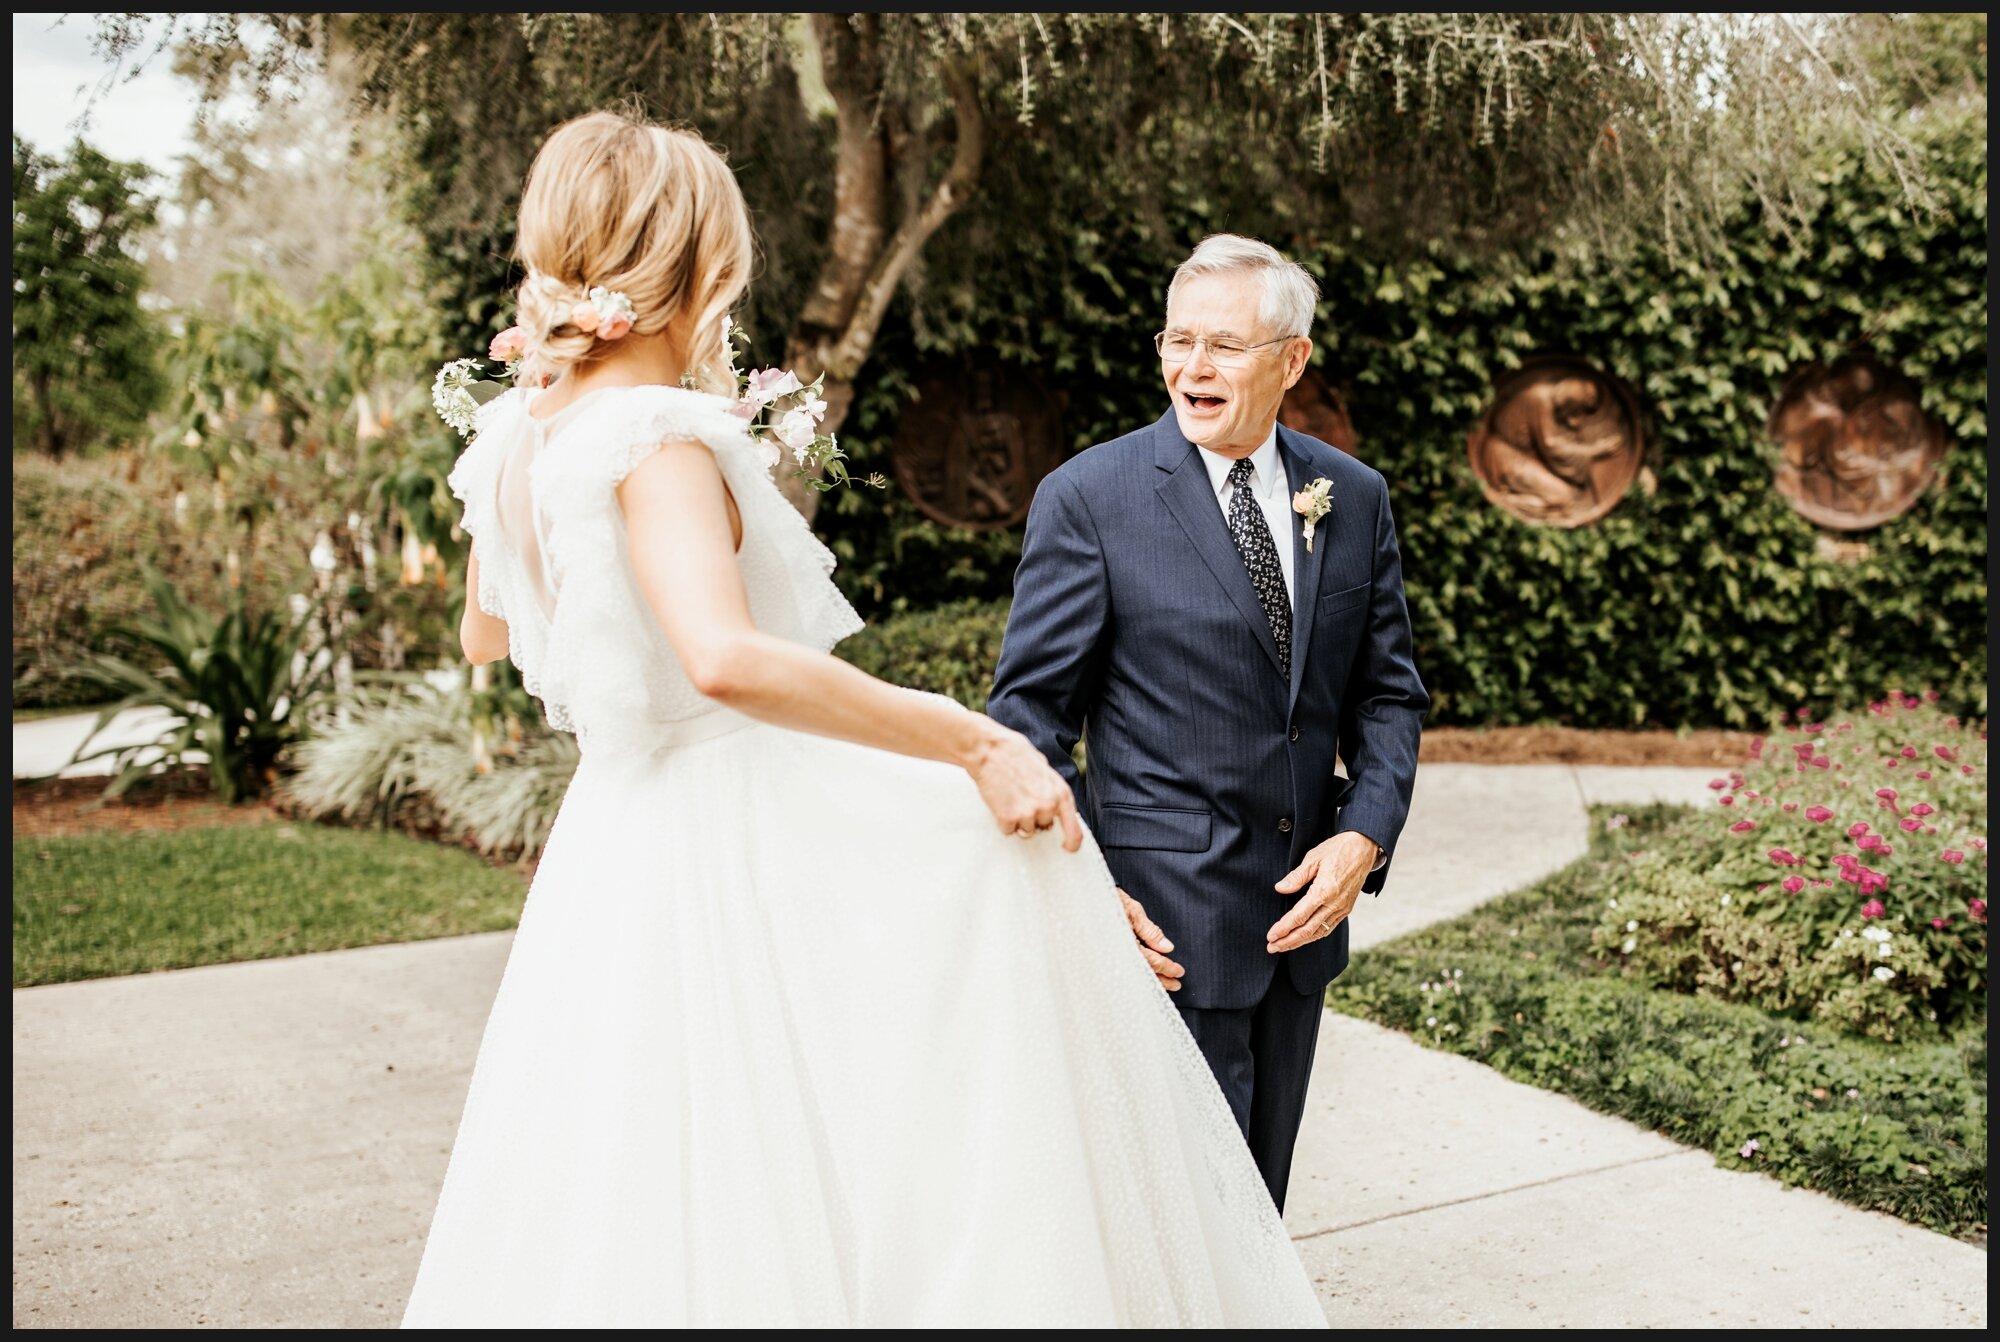 Orlando-Wedding-Photographer-destination-wedding-photographer-florida-wedding-photographer-hawaii-wedding-photographer_0748.jpg